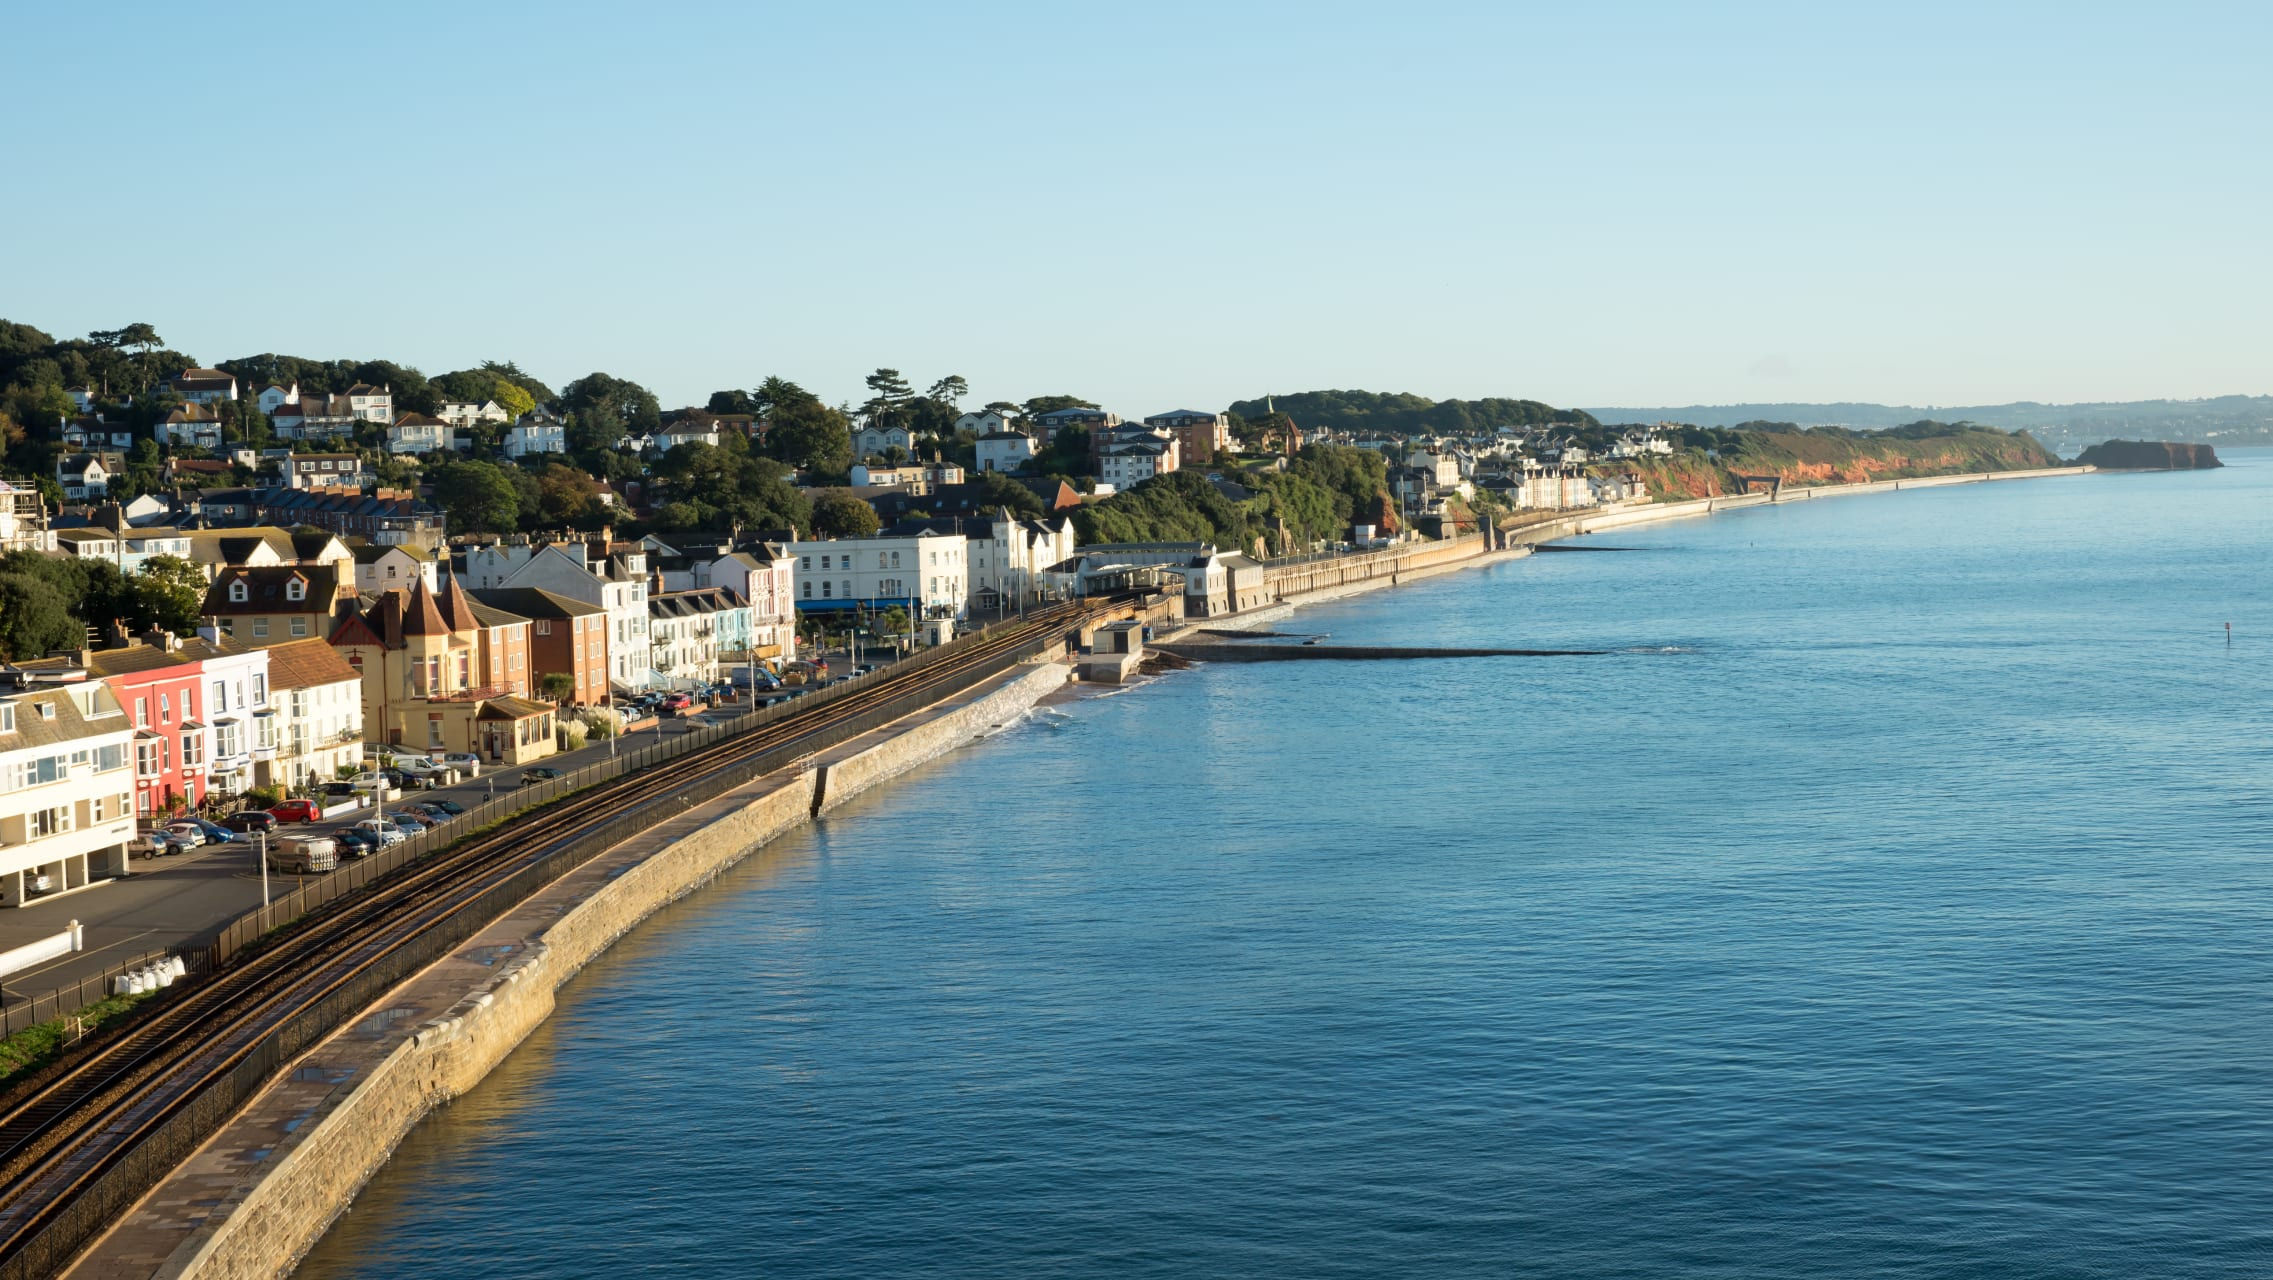 Devon - Dawlish: Coastal Town and Home of the Black Swan (Silent Tour)